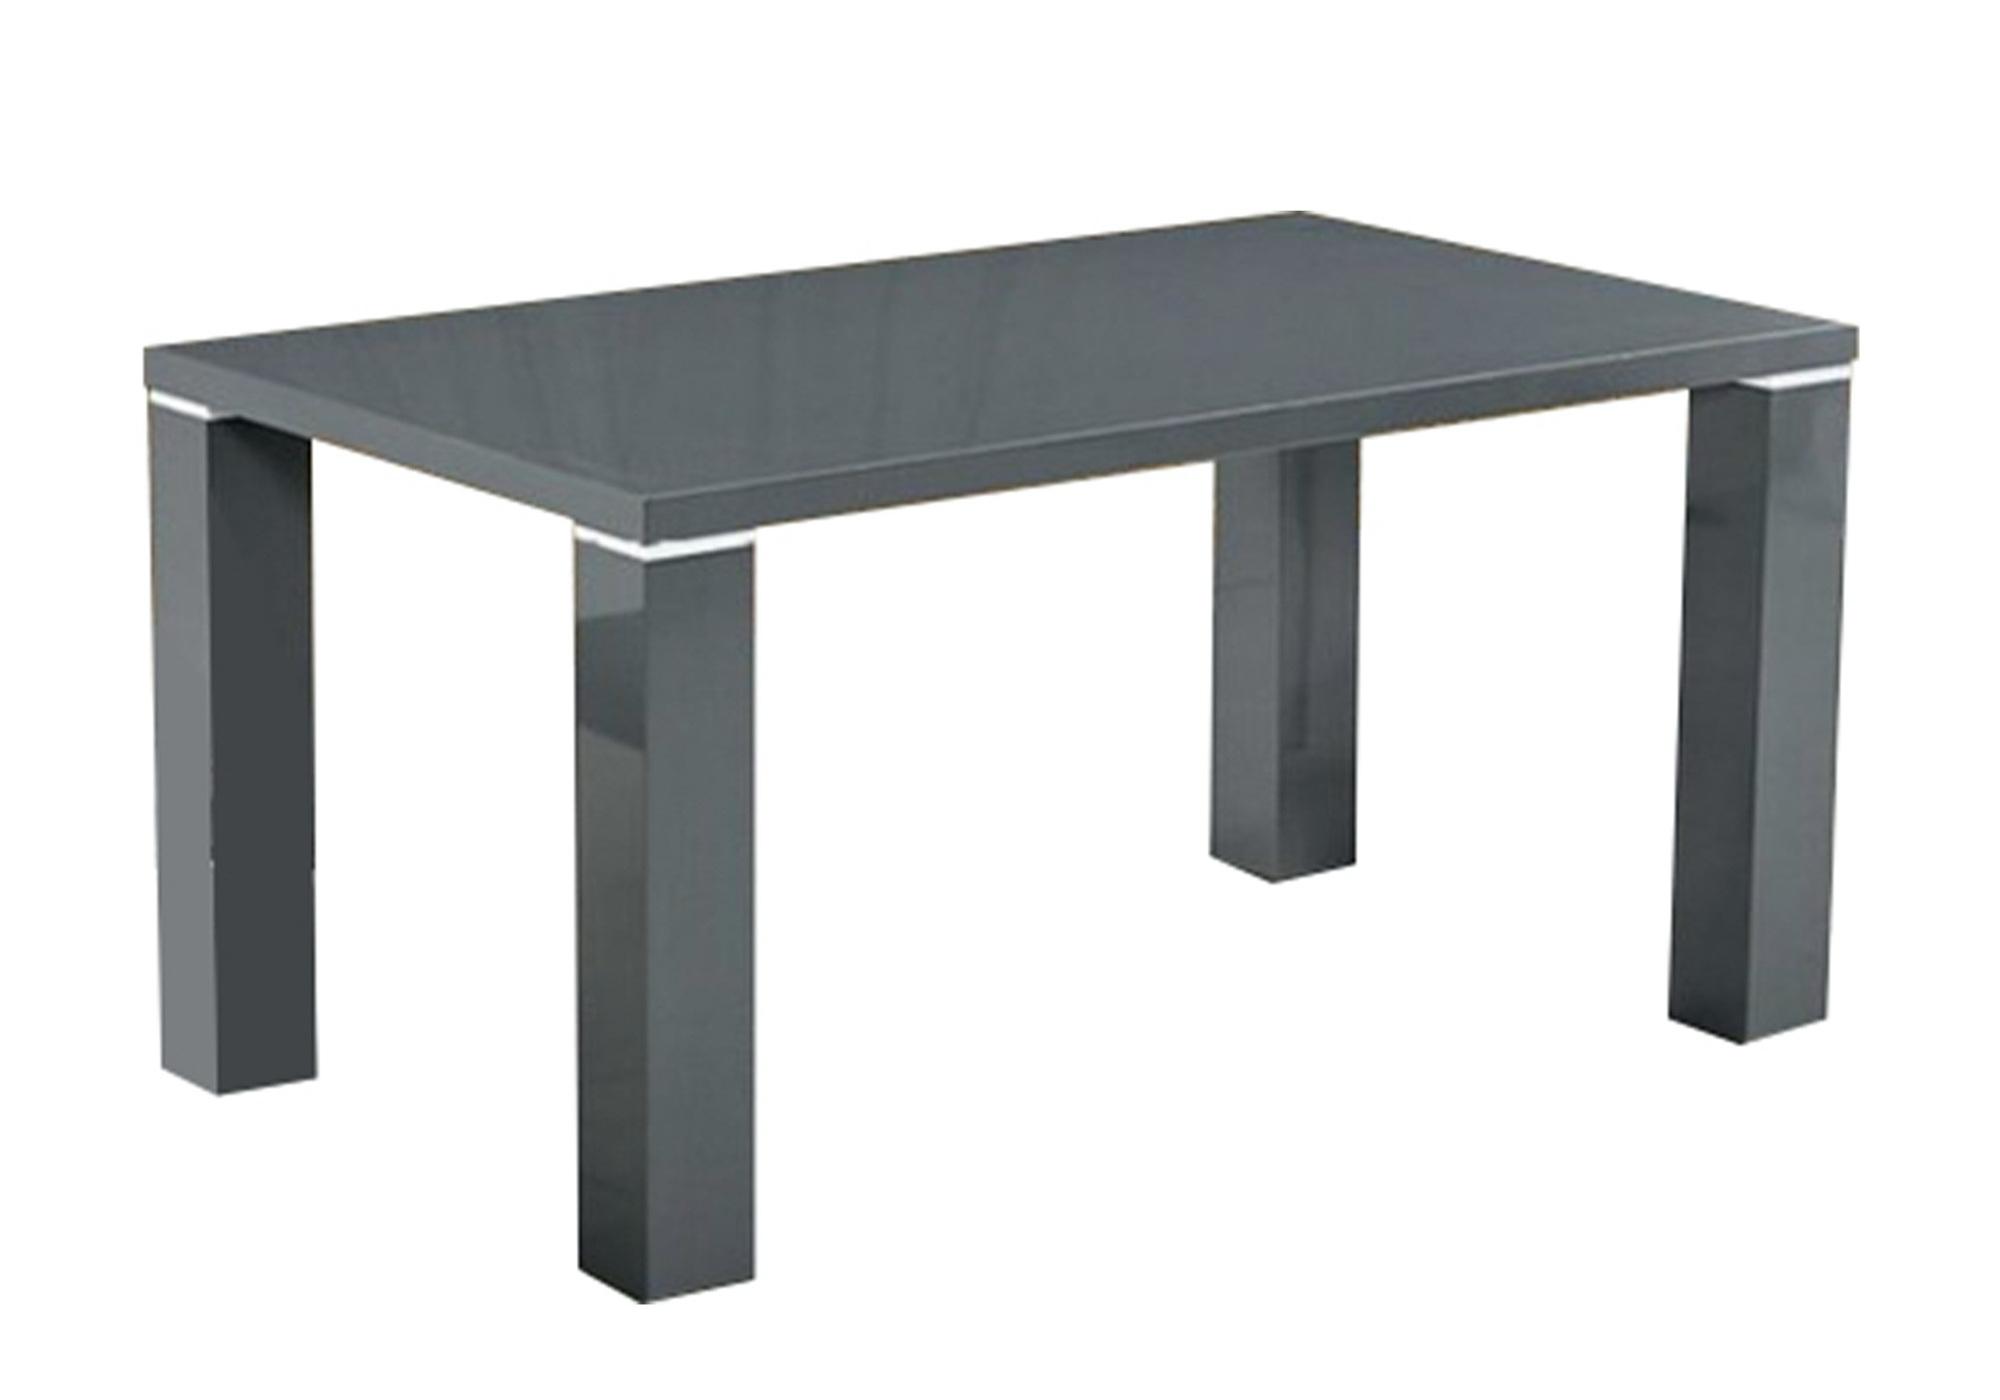 Table manger laqué gris UGO